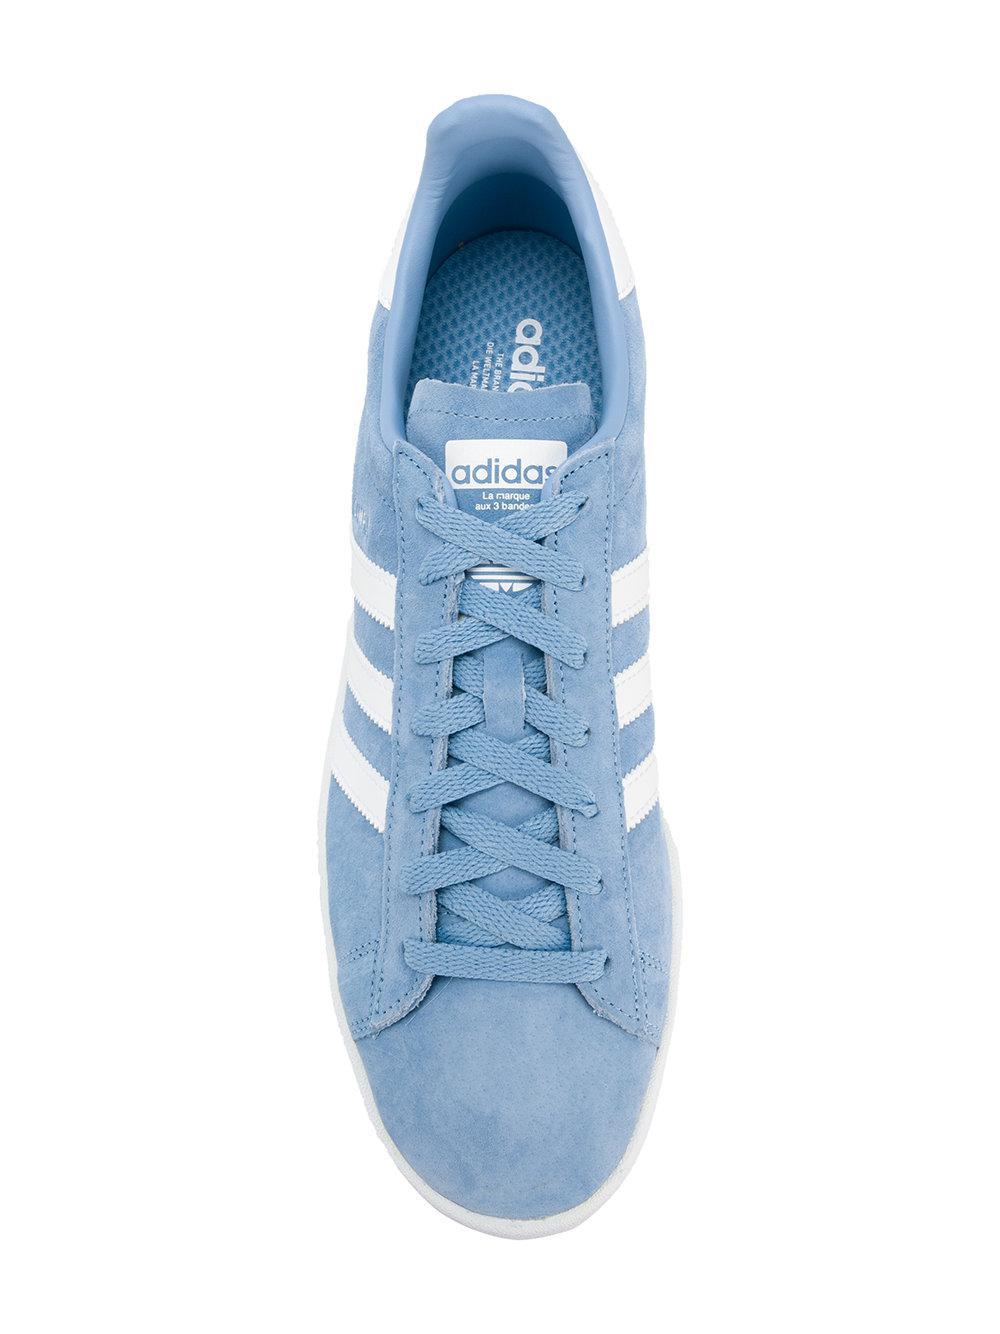 Lyst Adidas Originali Campus Scarpe Blu Per Gli Uomini.